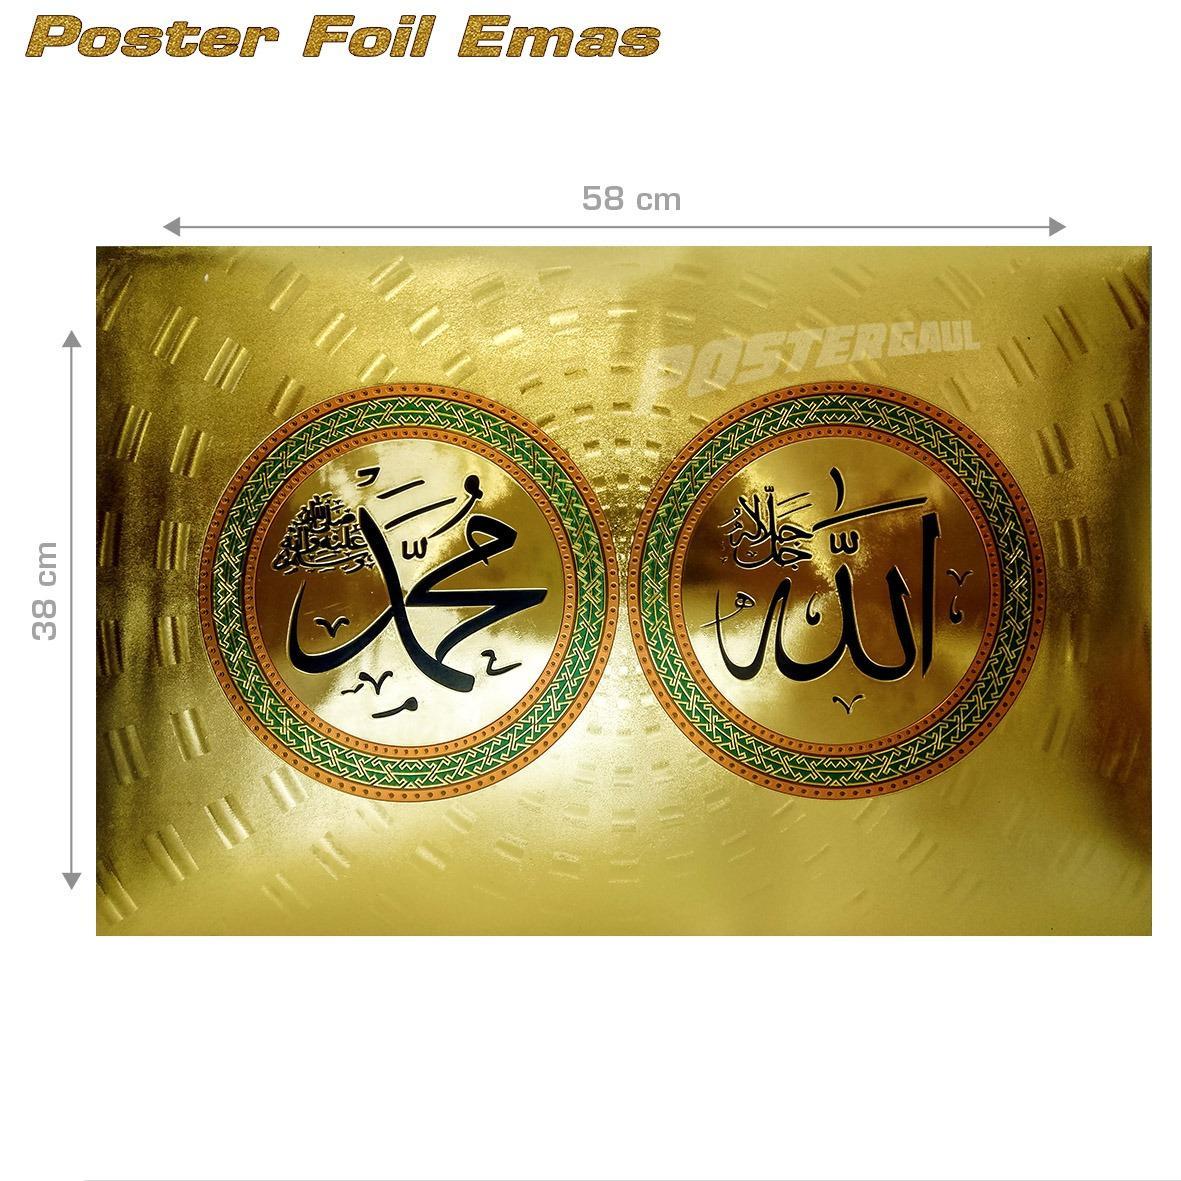 Poster Foil: KALIGRAFI ISLAM LAFADZ ALLAH & MUHAMMAD #FO42 - 38 x 58 cm